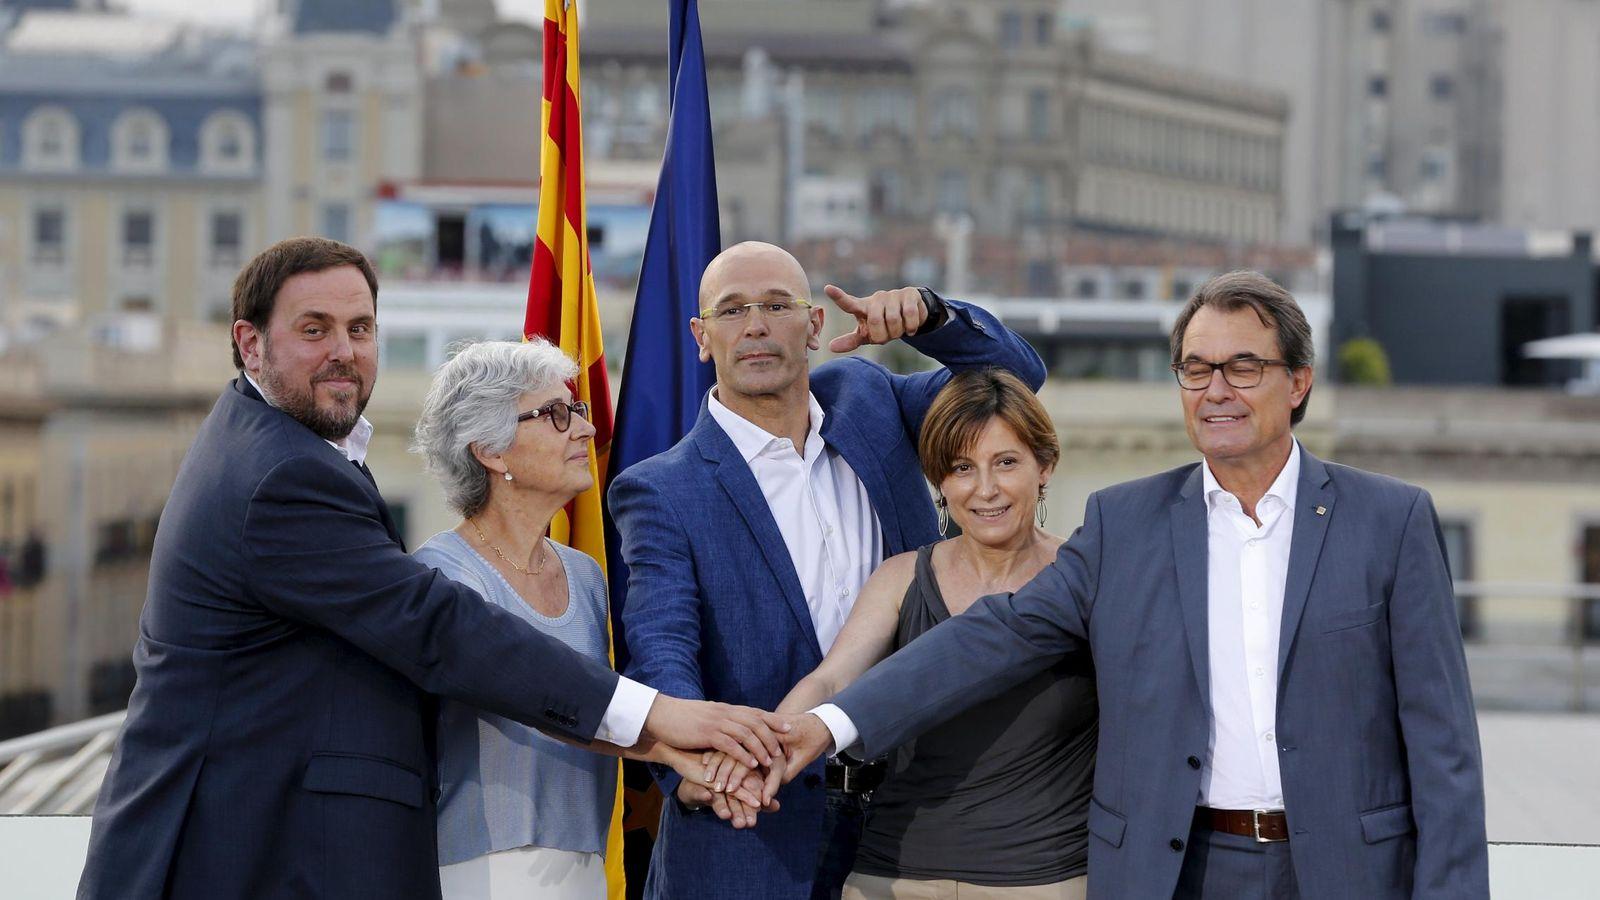 Foto: Raül Romeva, en el centro, es el cabeza de la lista de CDC y ERC. (Reuters)